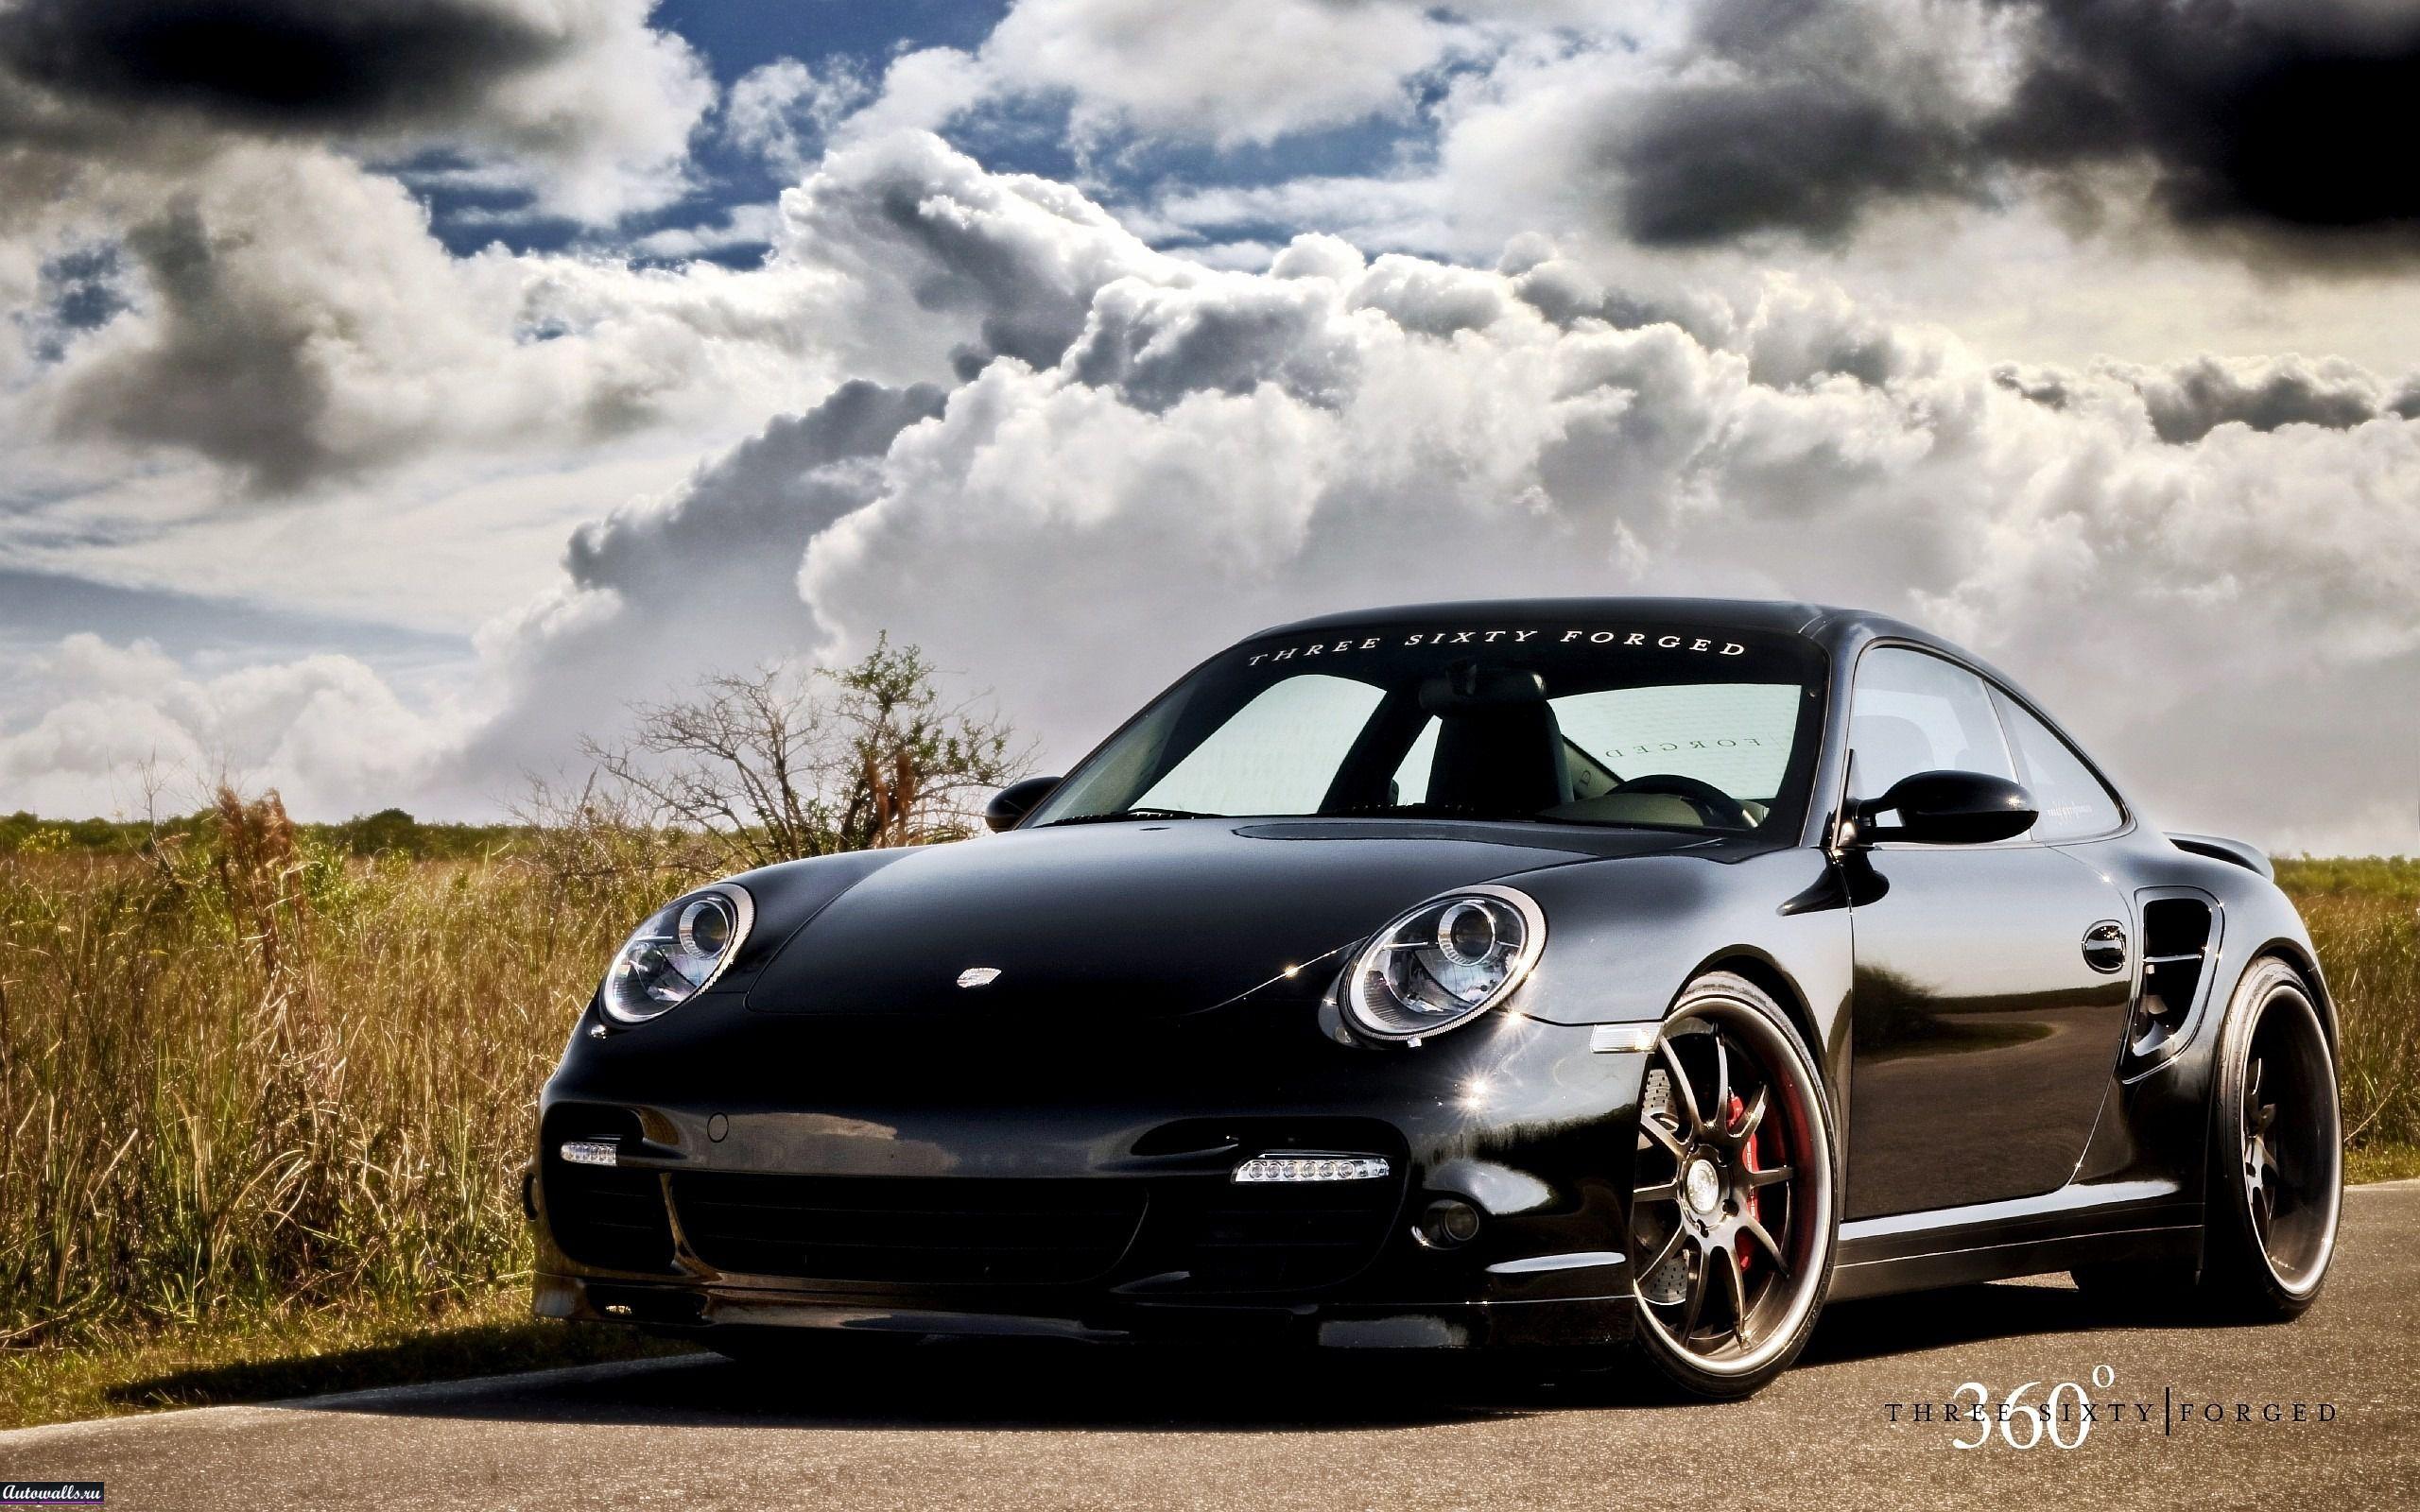 Porsche 997 tt forged wheels